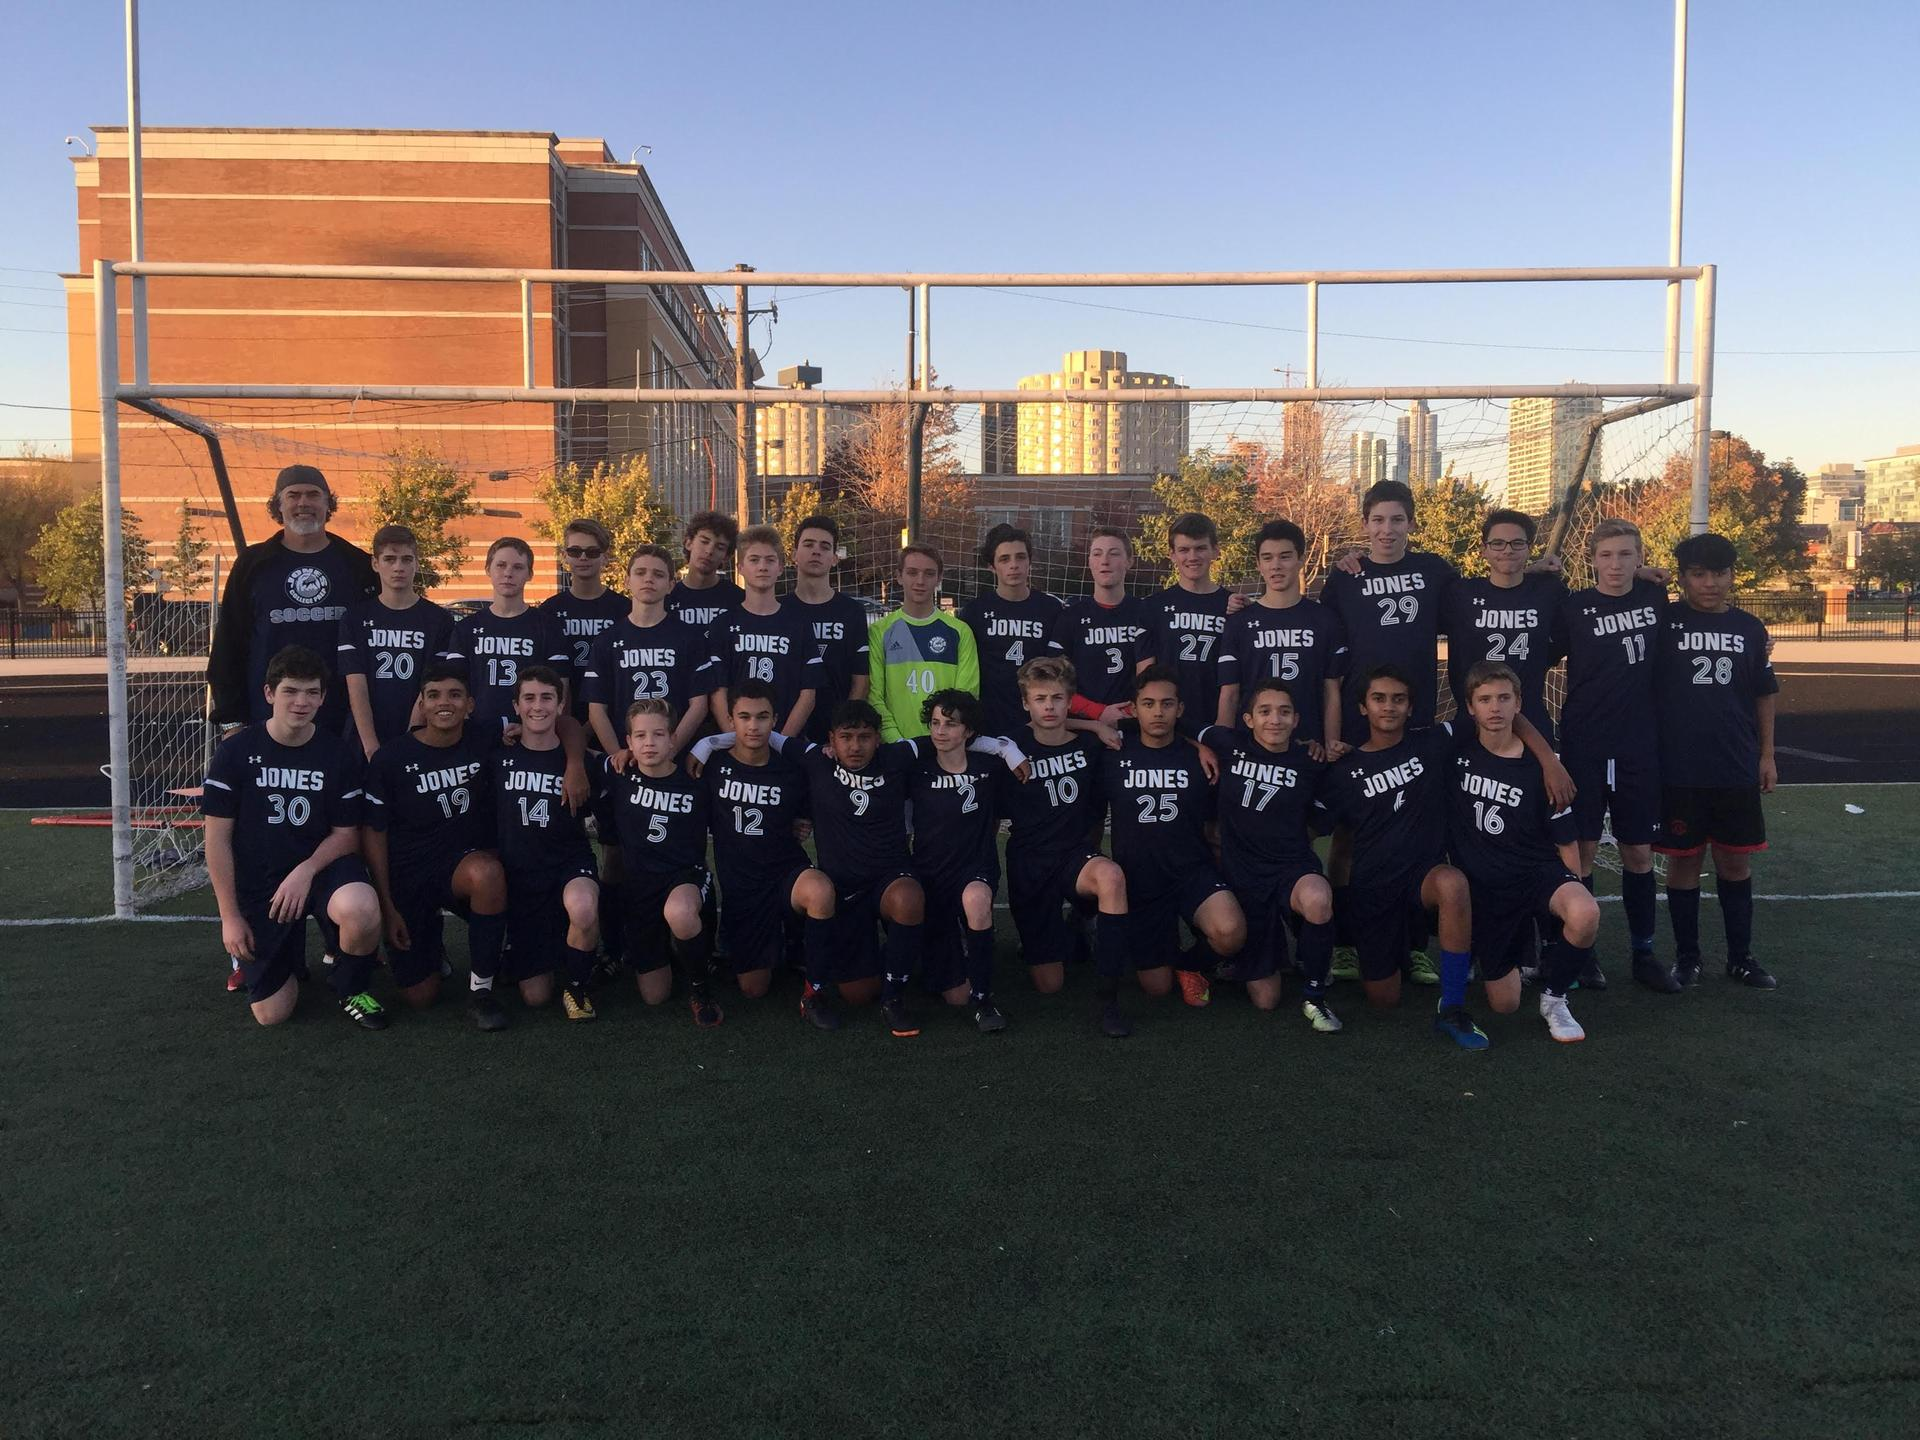 Image 2019 Boys Soccer